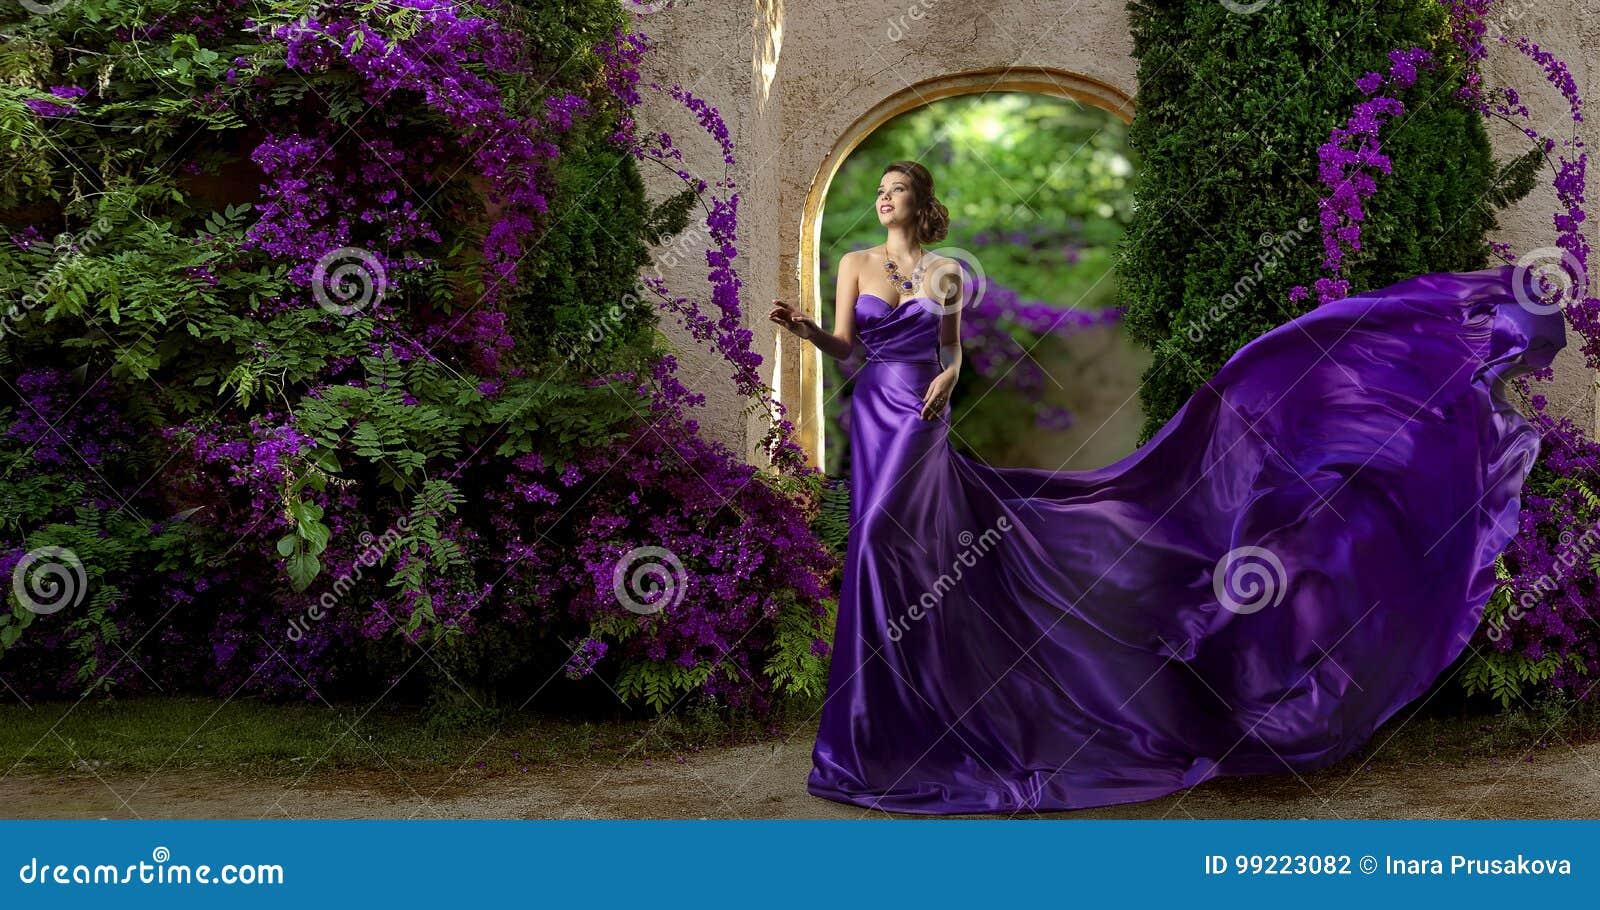 Mode-Modell Purple Dress, Frauen-langes Silk Kleid, Violet Garden